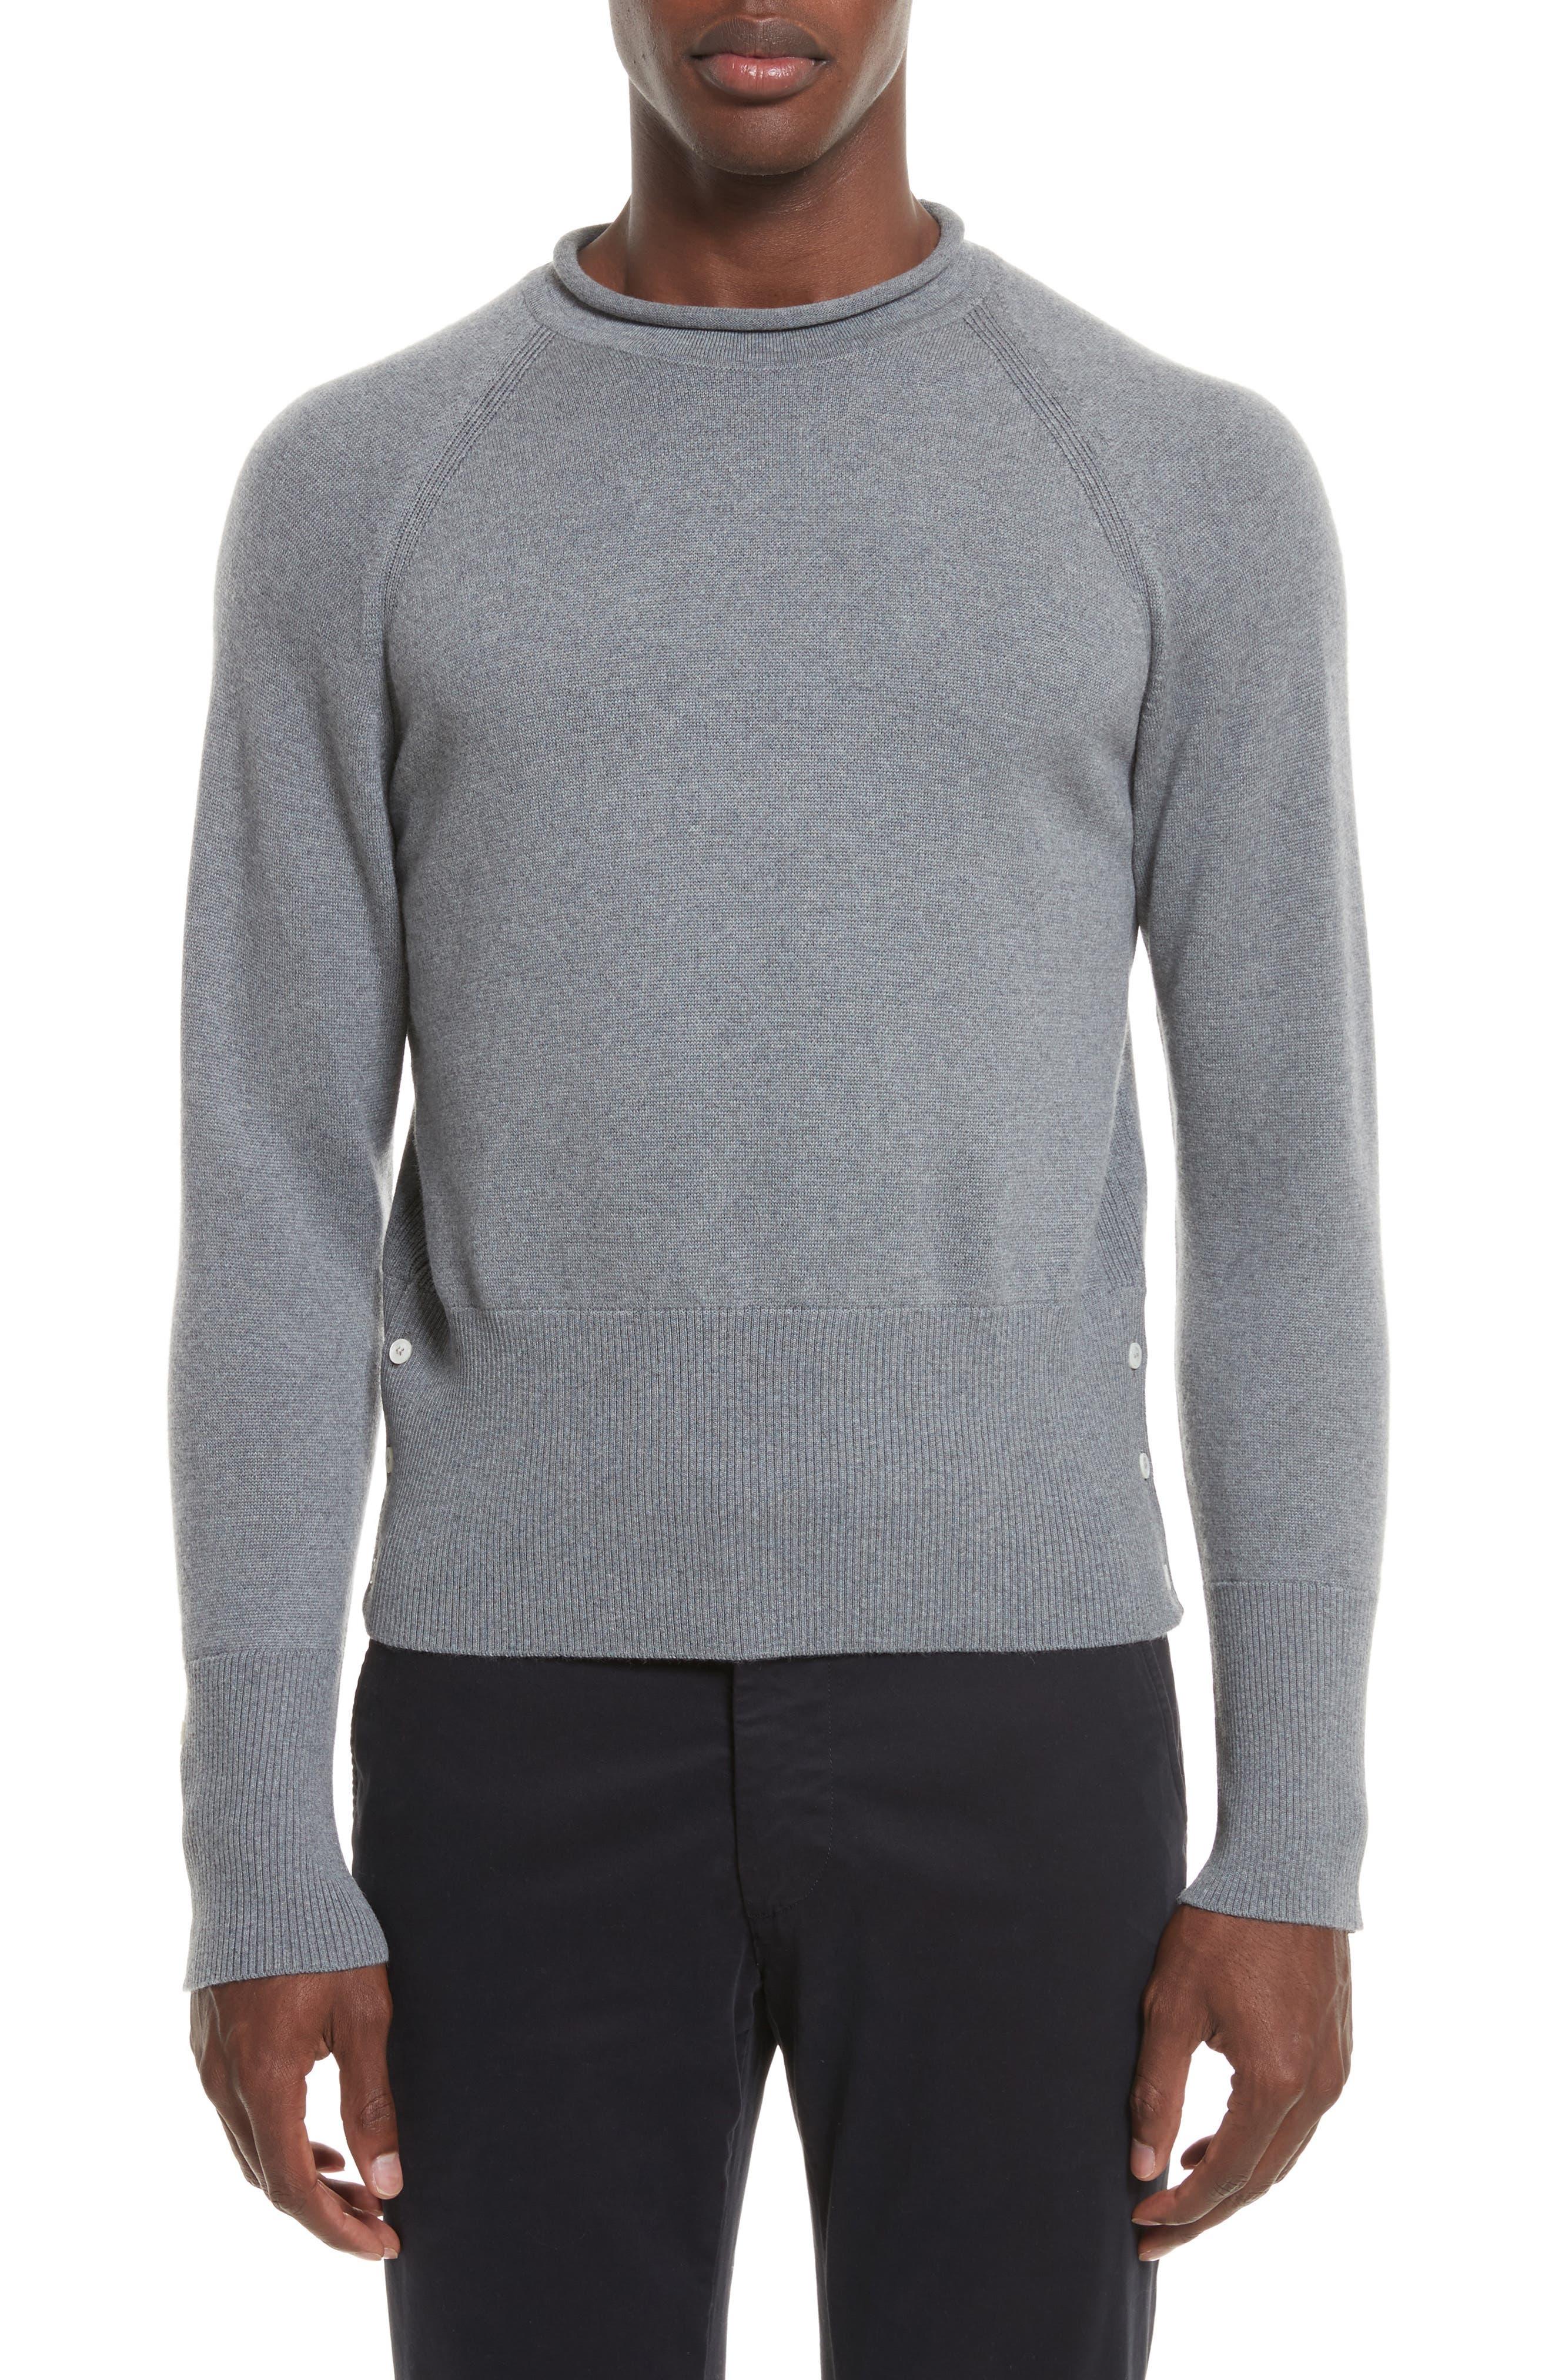 Thom Browne Raglan Merino Wool Sweater